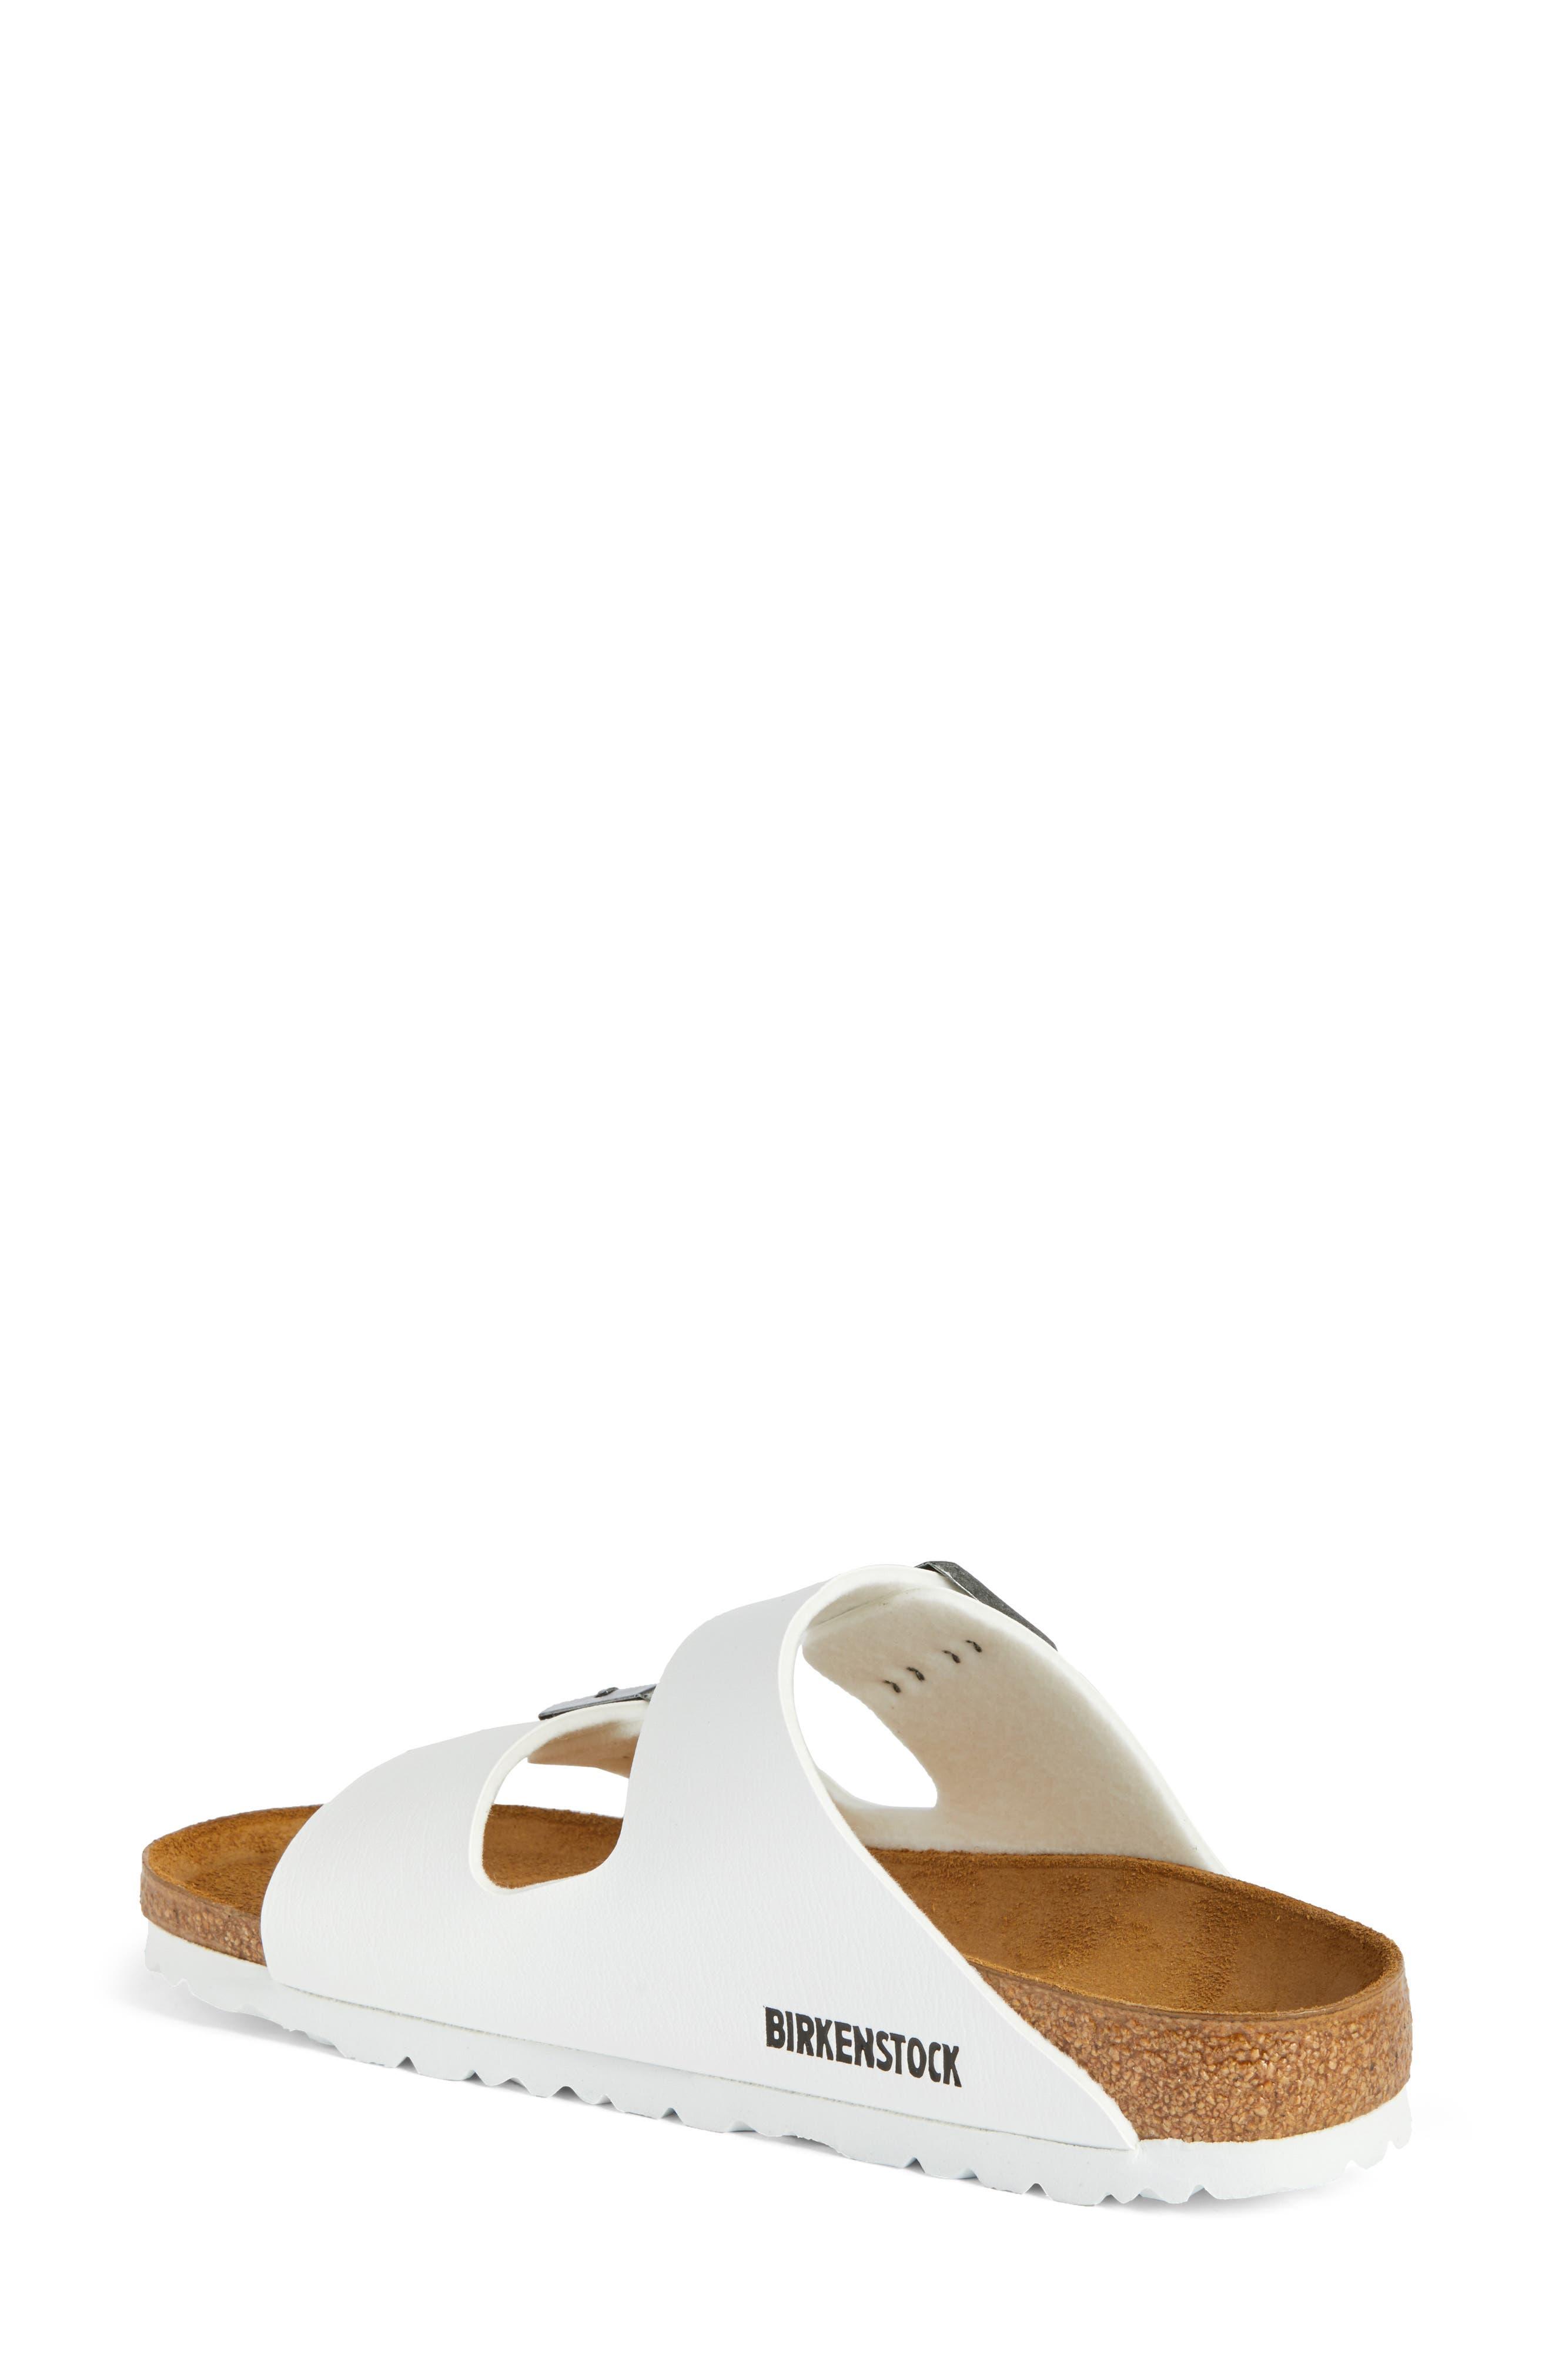 BIRKENSTOCK, 'Arizona' White Birko-Flor Sandal, Alternate thumbnail 2, color, WHITE SYNTHETIC LEATHER